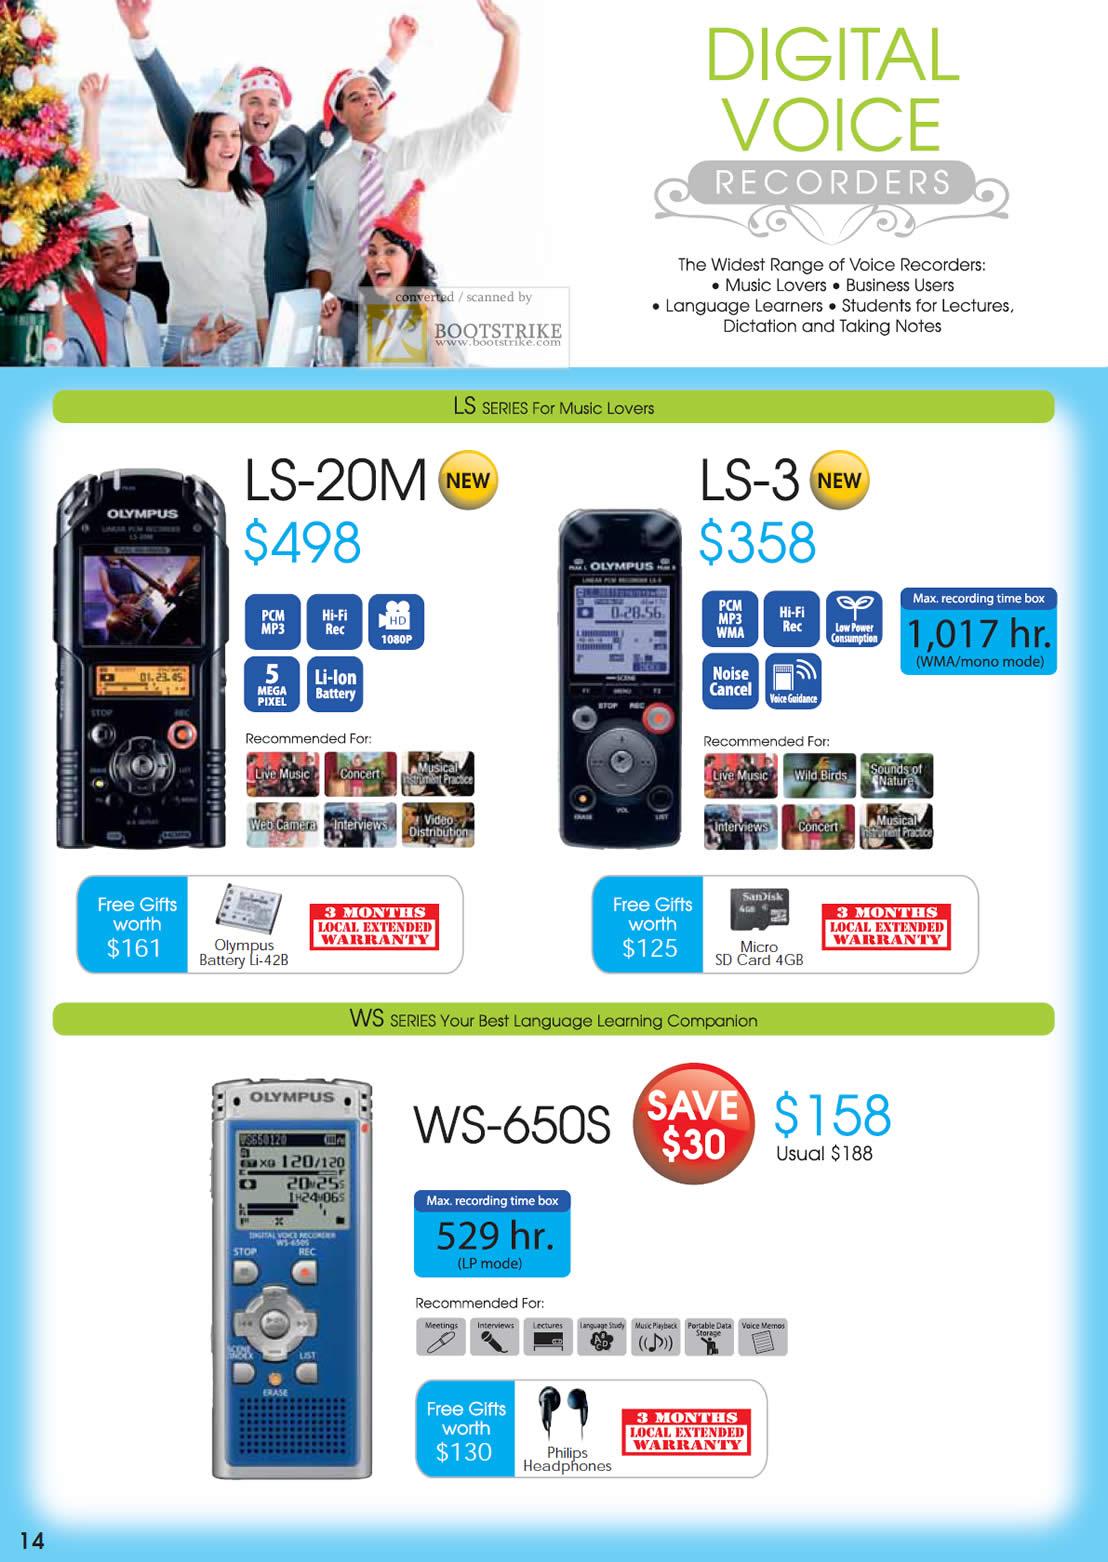 SITEX 2011 price list image brochure of Olympus Digital Voice Recorders LS-20M, LS-3, WS-650S